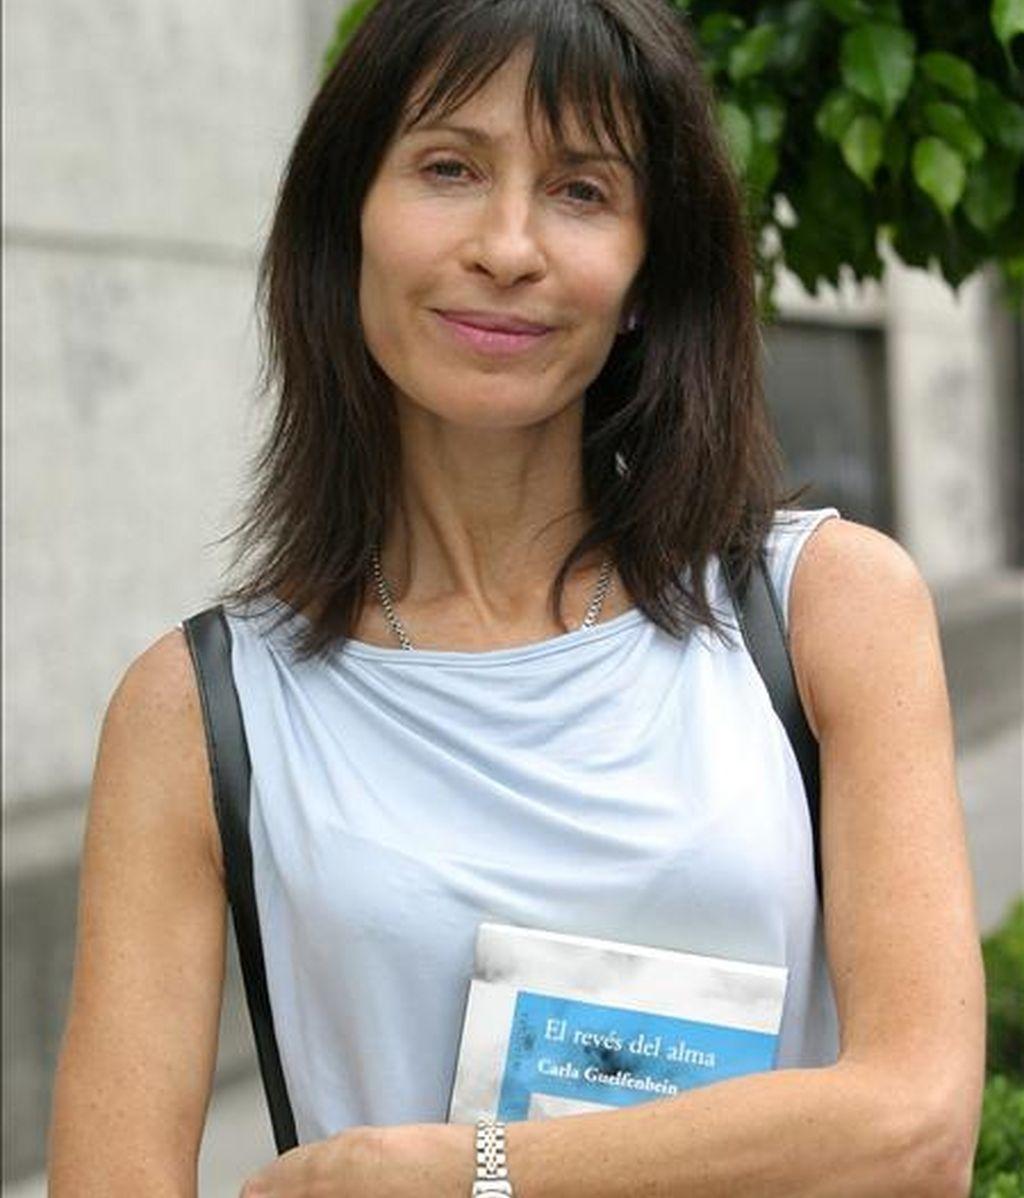 La escritora chilena Carla Guelfenbein. EFE/Archivo